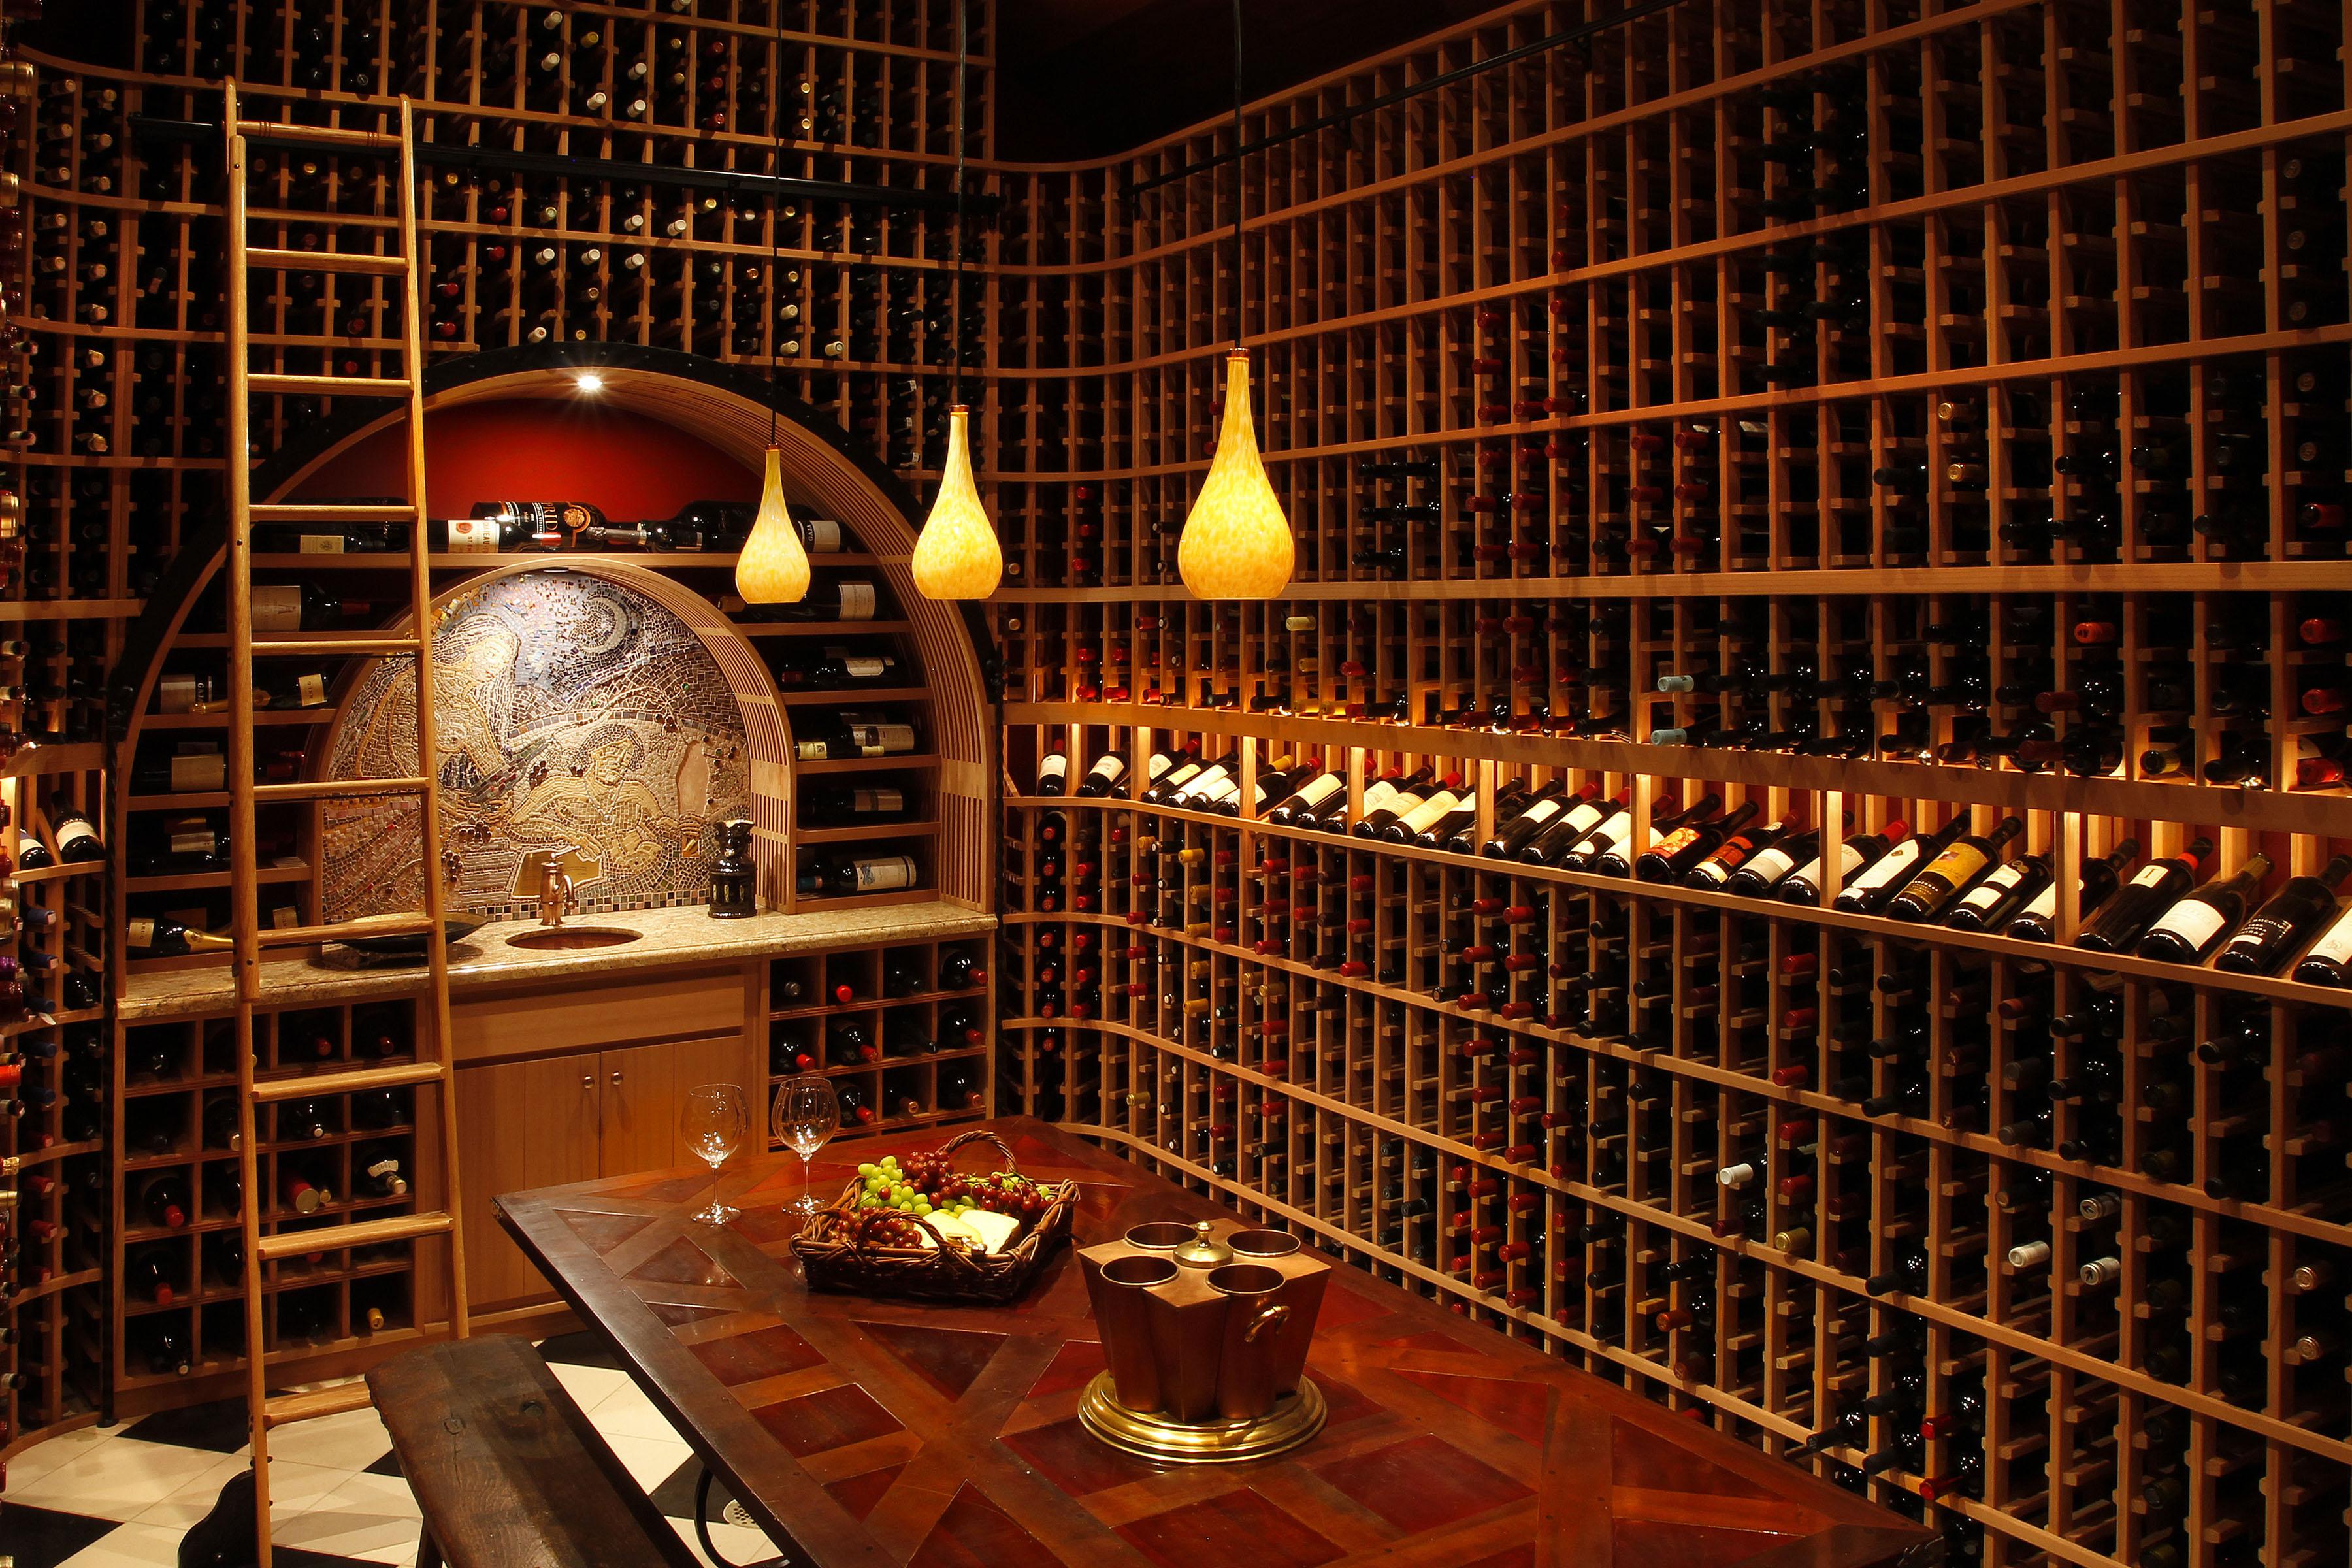 C03 -  27 - Wine Cellar Lower Floor Leve